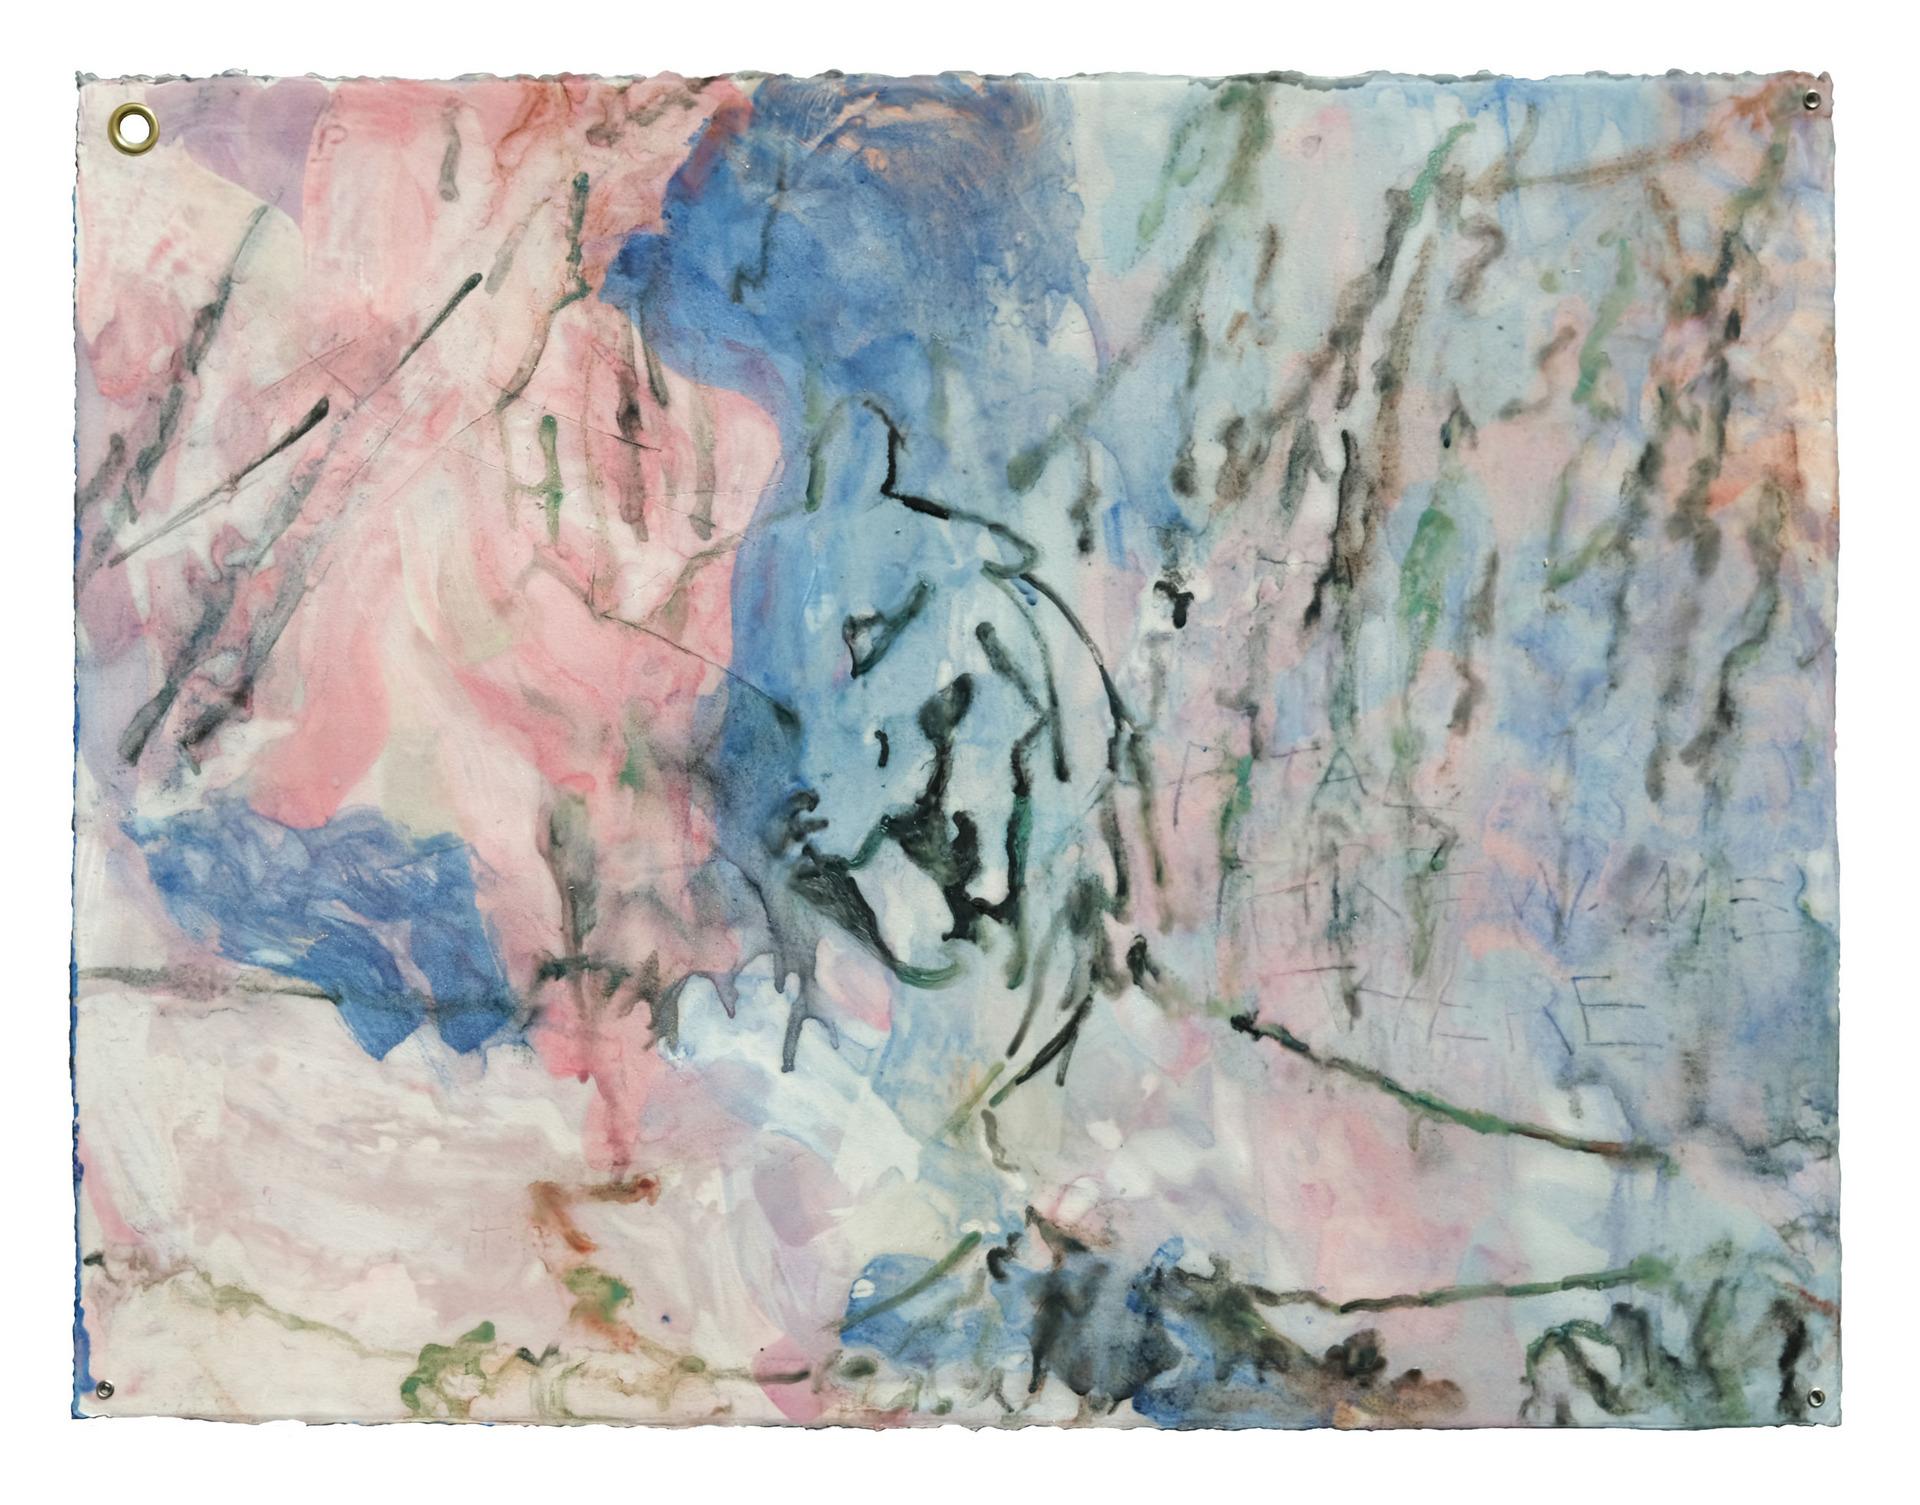 whore2: rampant lion, pink, blue & scratches